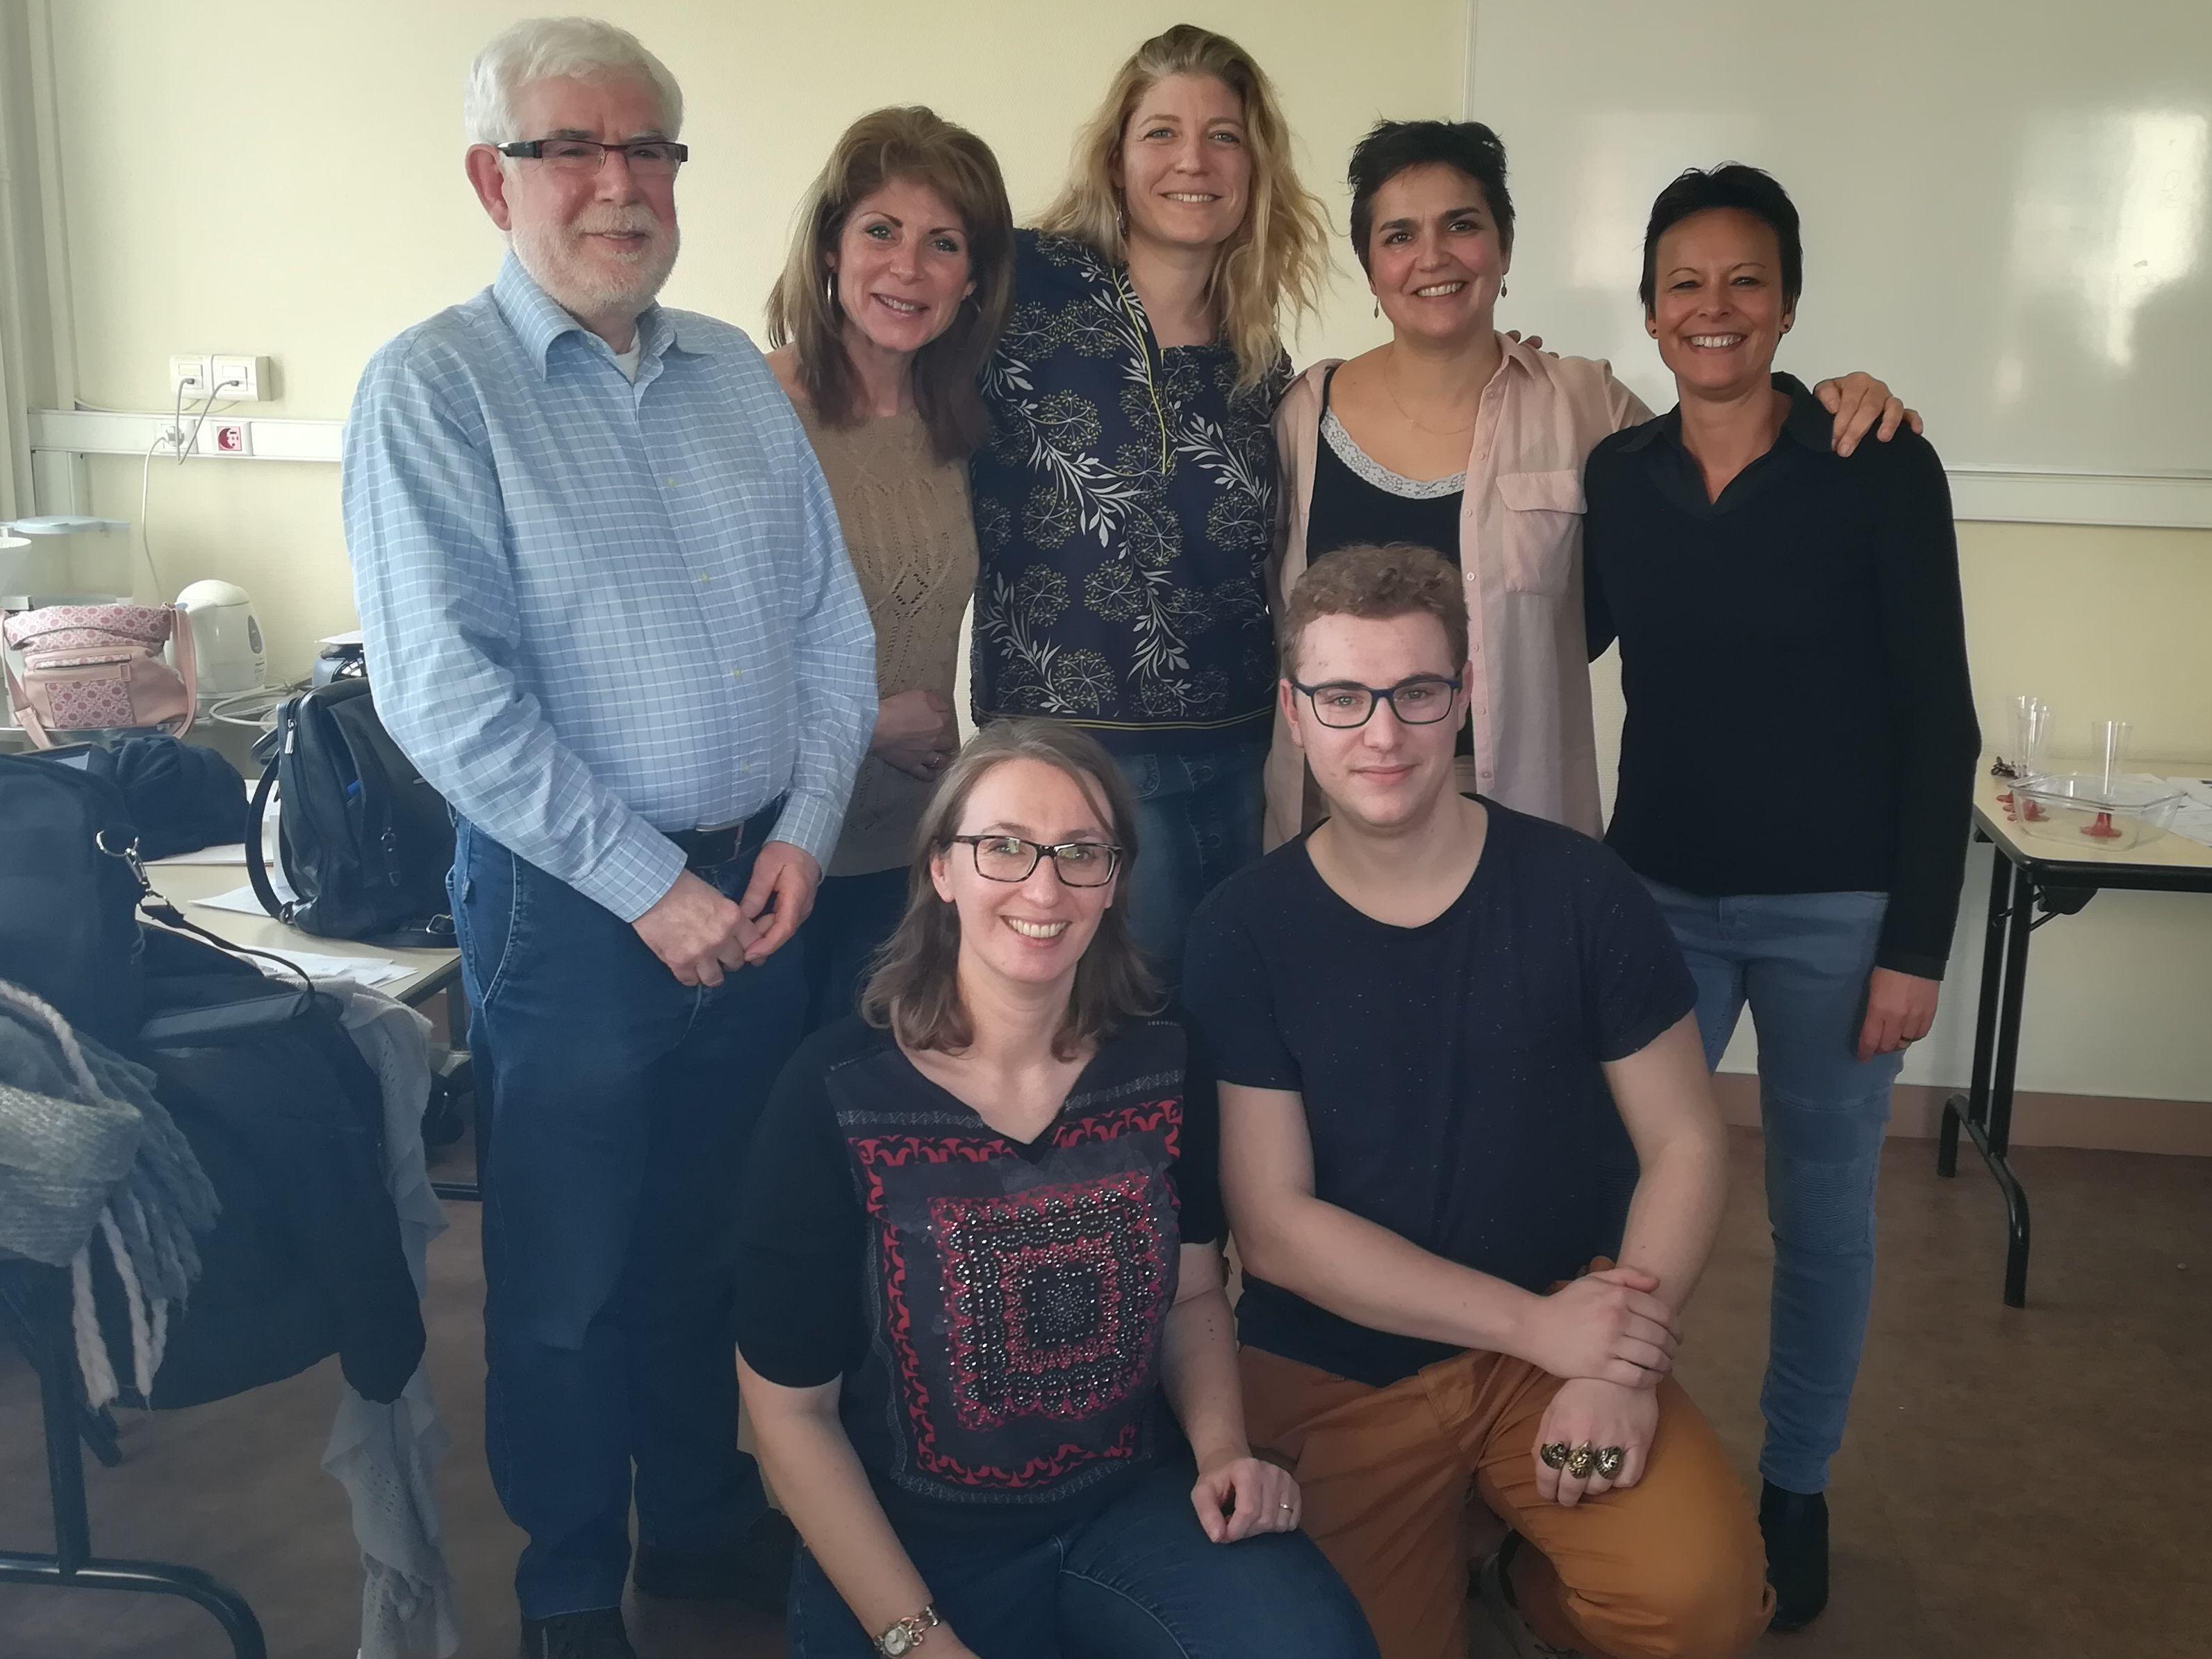 Conseil d'administration 2018 : Bernard, Isabelle, Anne, Sandrine, Sandy, Karine, Loïc